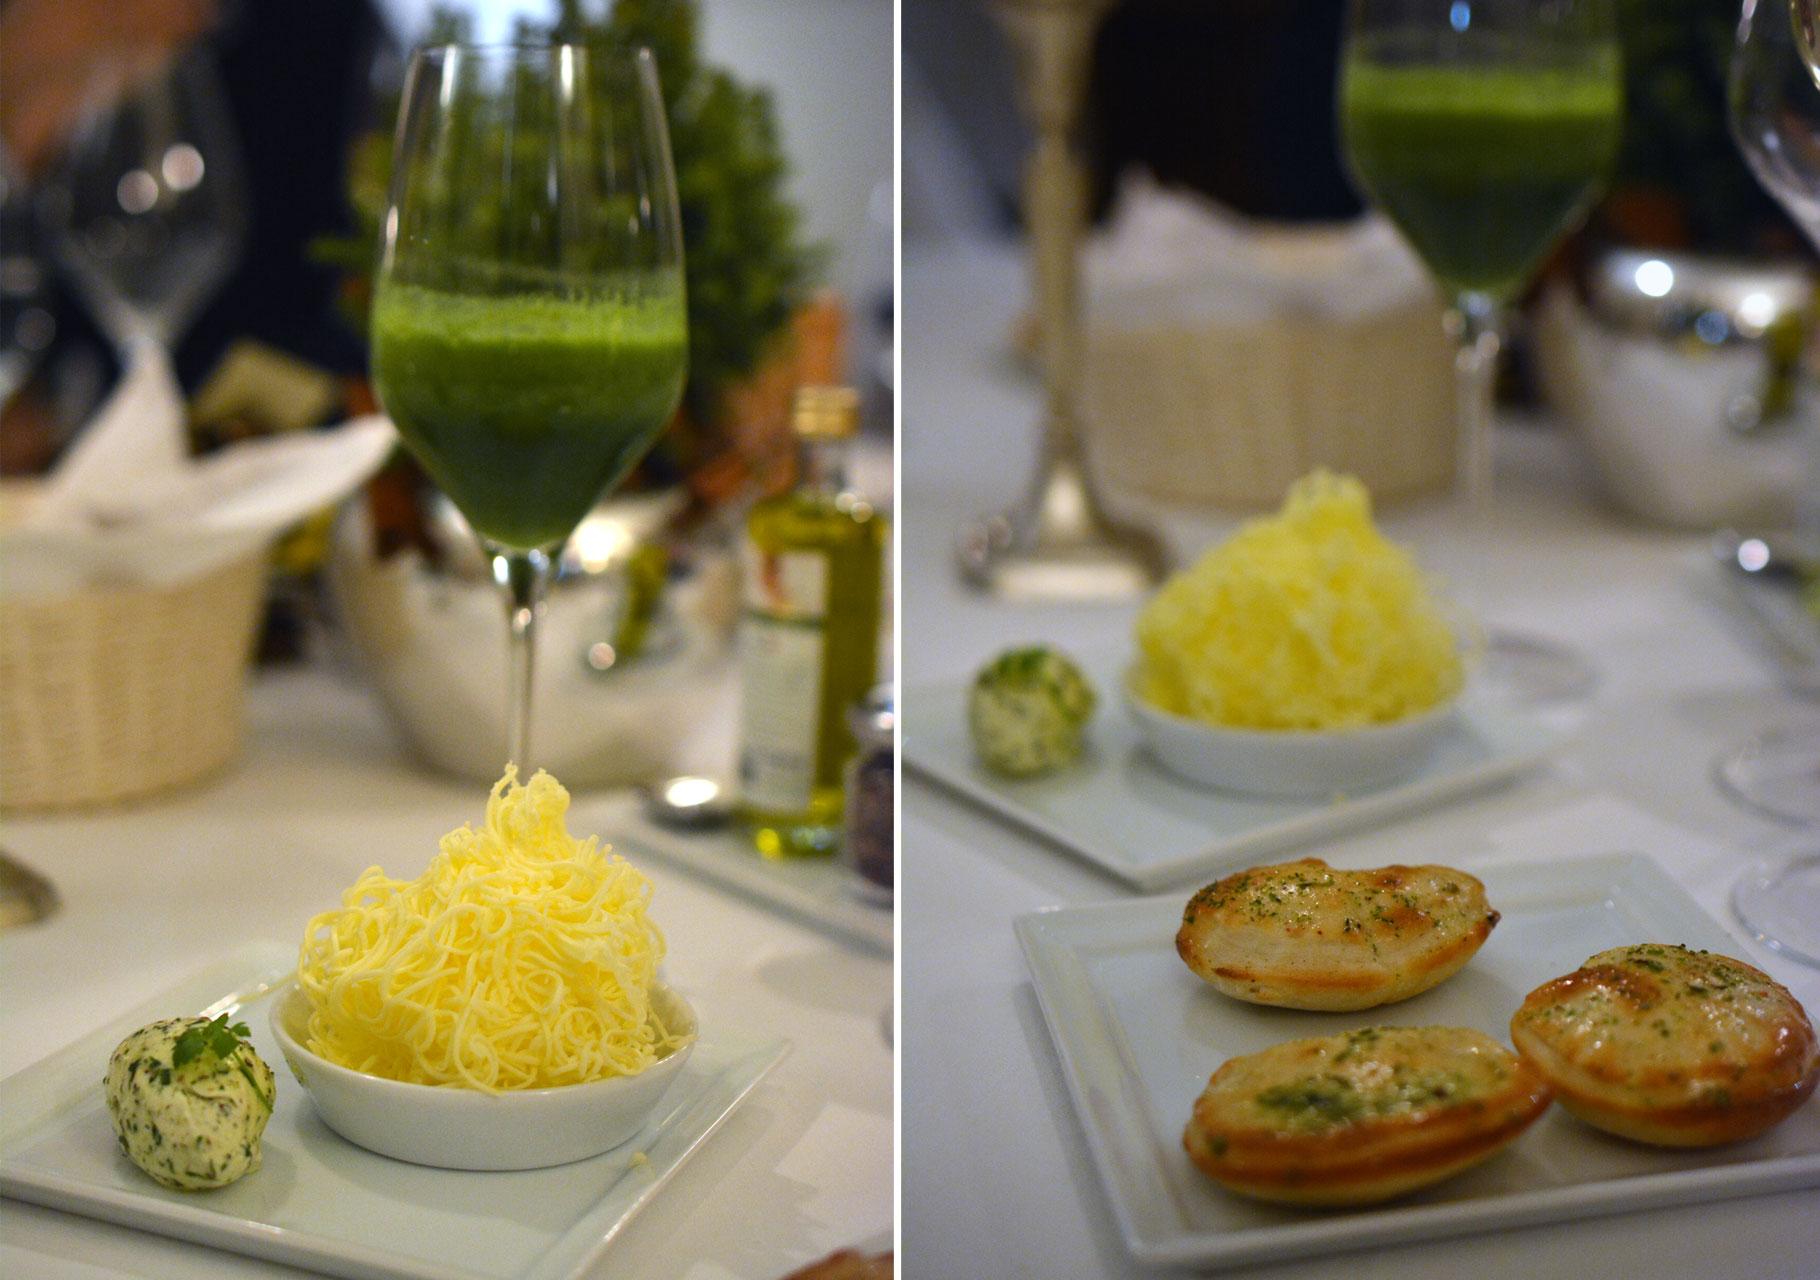 Fladenbrot mit Buchweizen, Butter, Mangold-Ingwer Vitaldrink